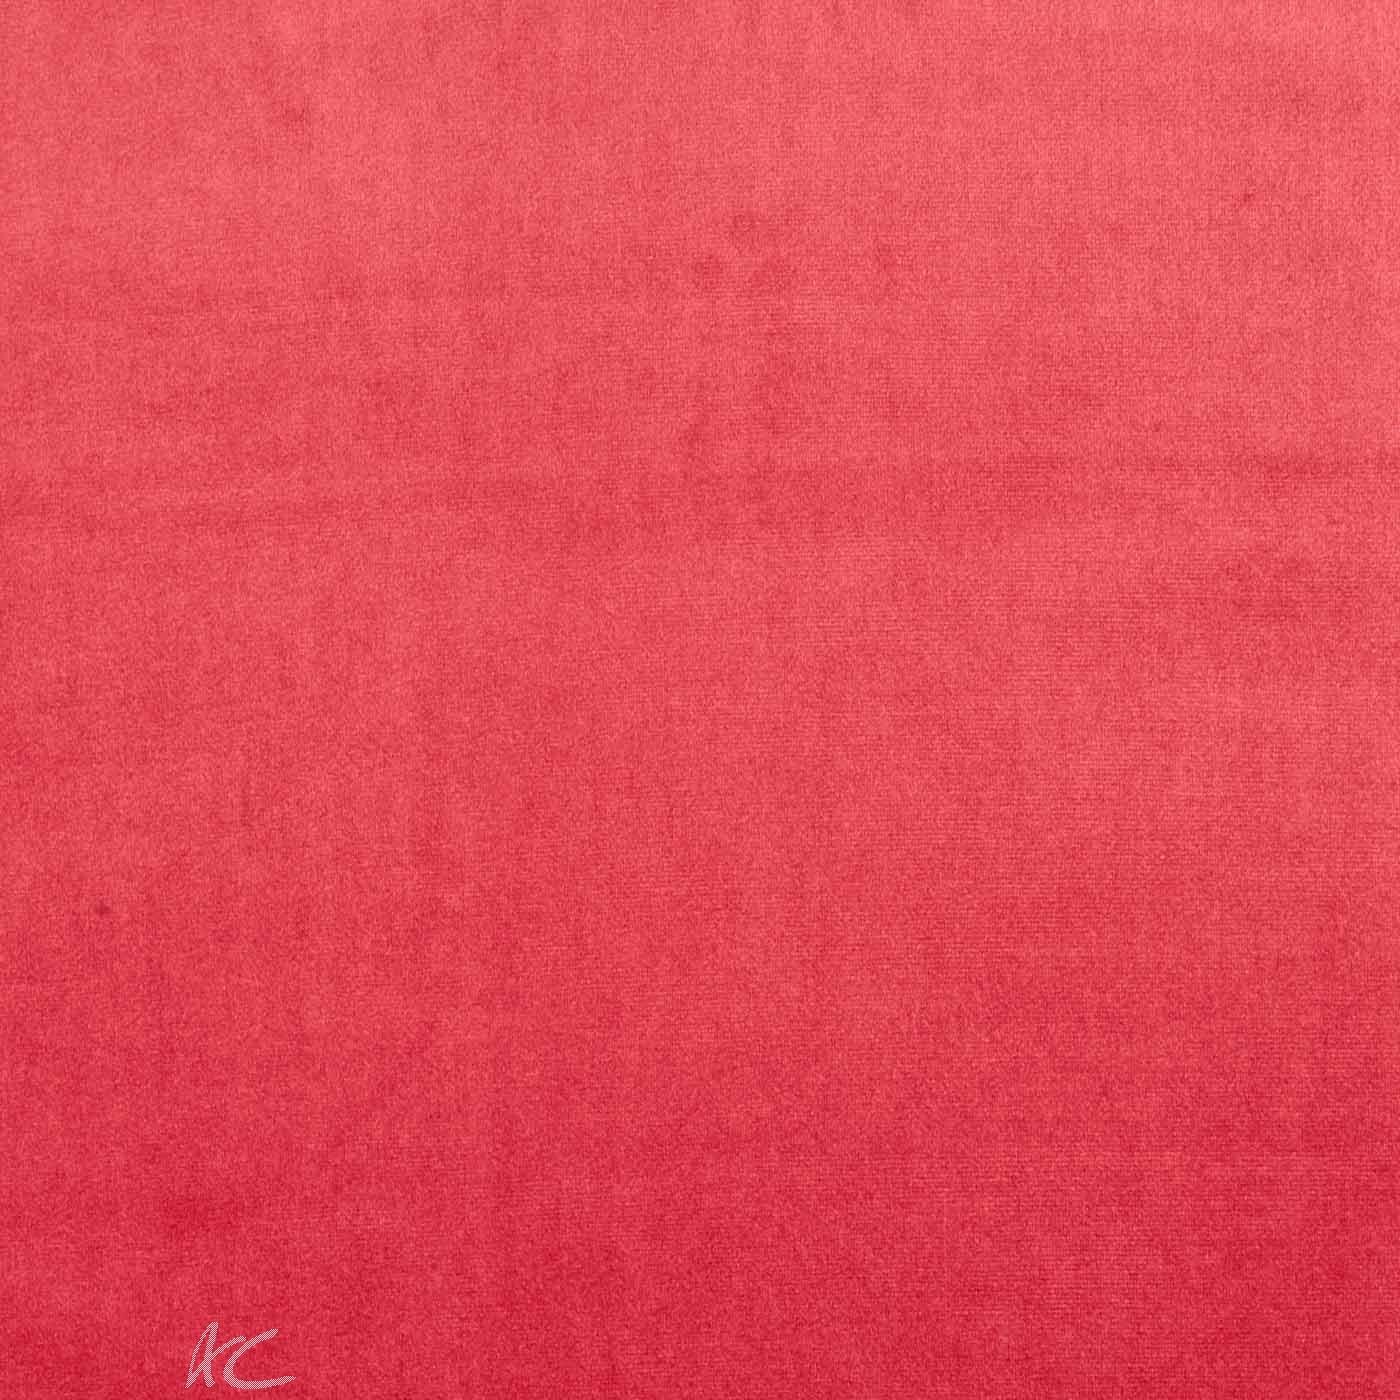 Velour Velour Fuchsia Cushion Covers